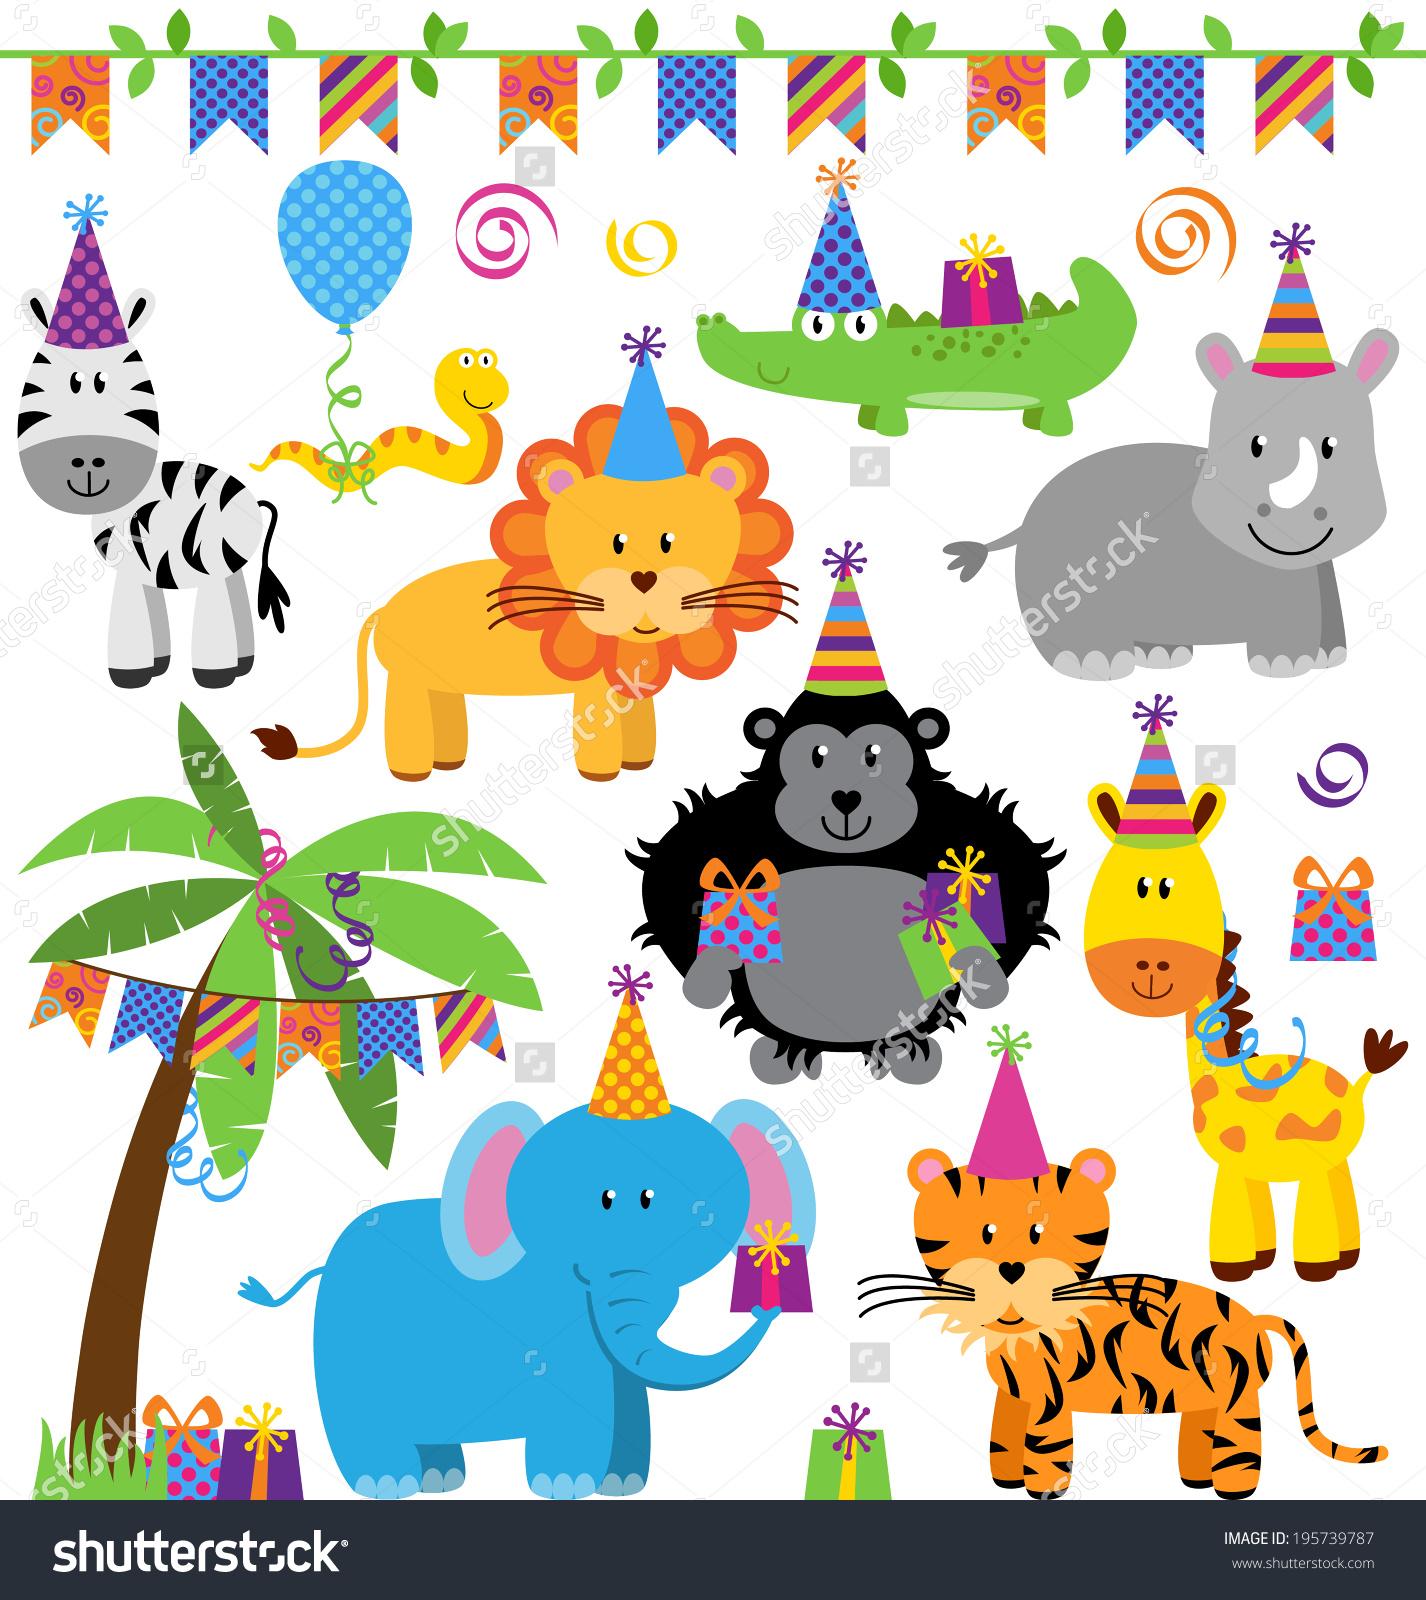 1st jungle animal birthday clipart freeuse stock 1st jungle animal birthday clipart - ClipartFest freeuse stock